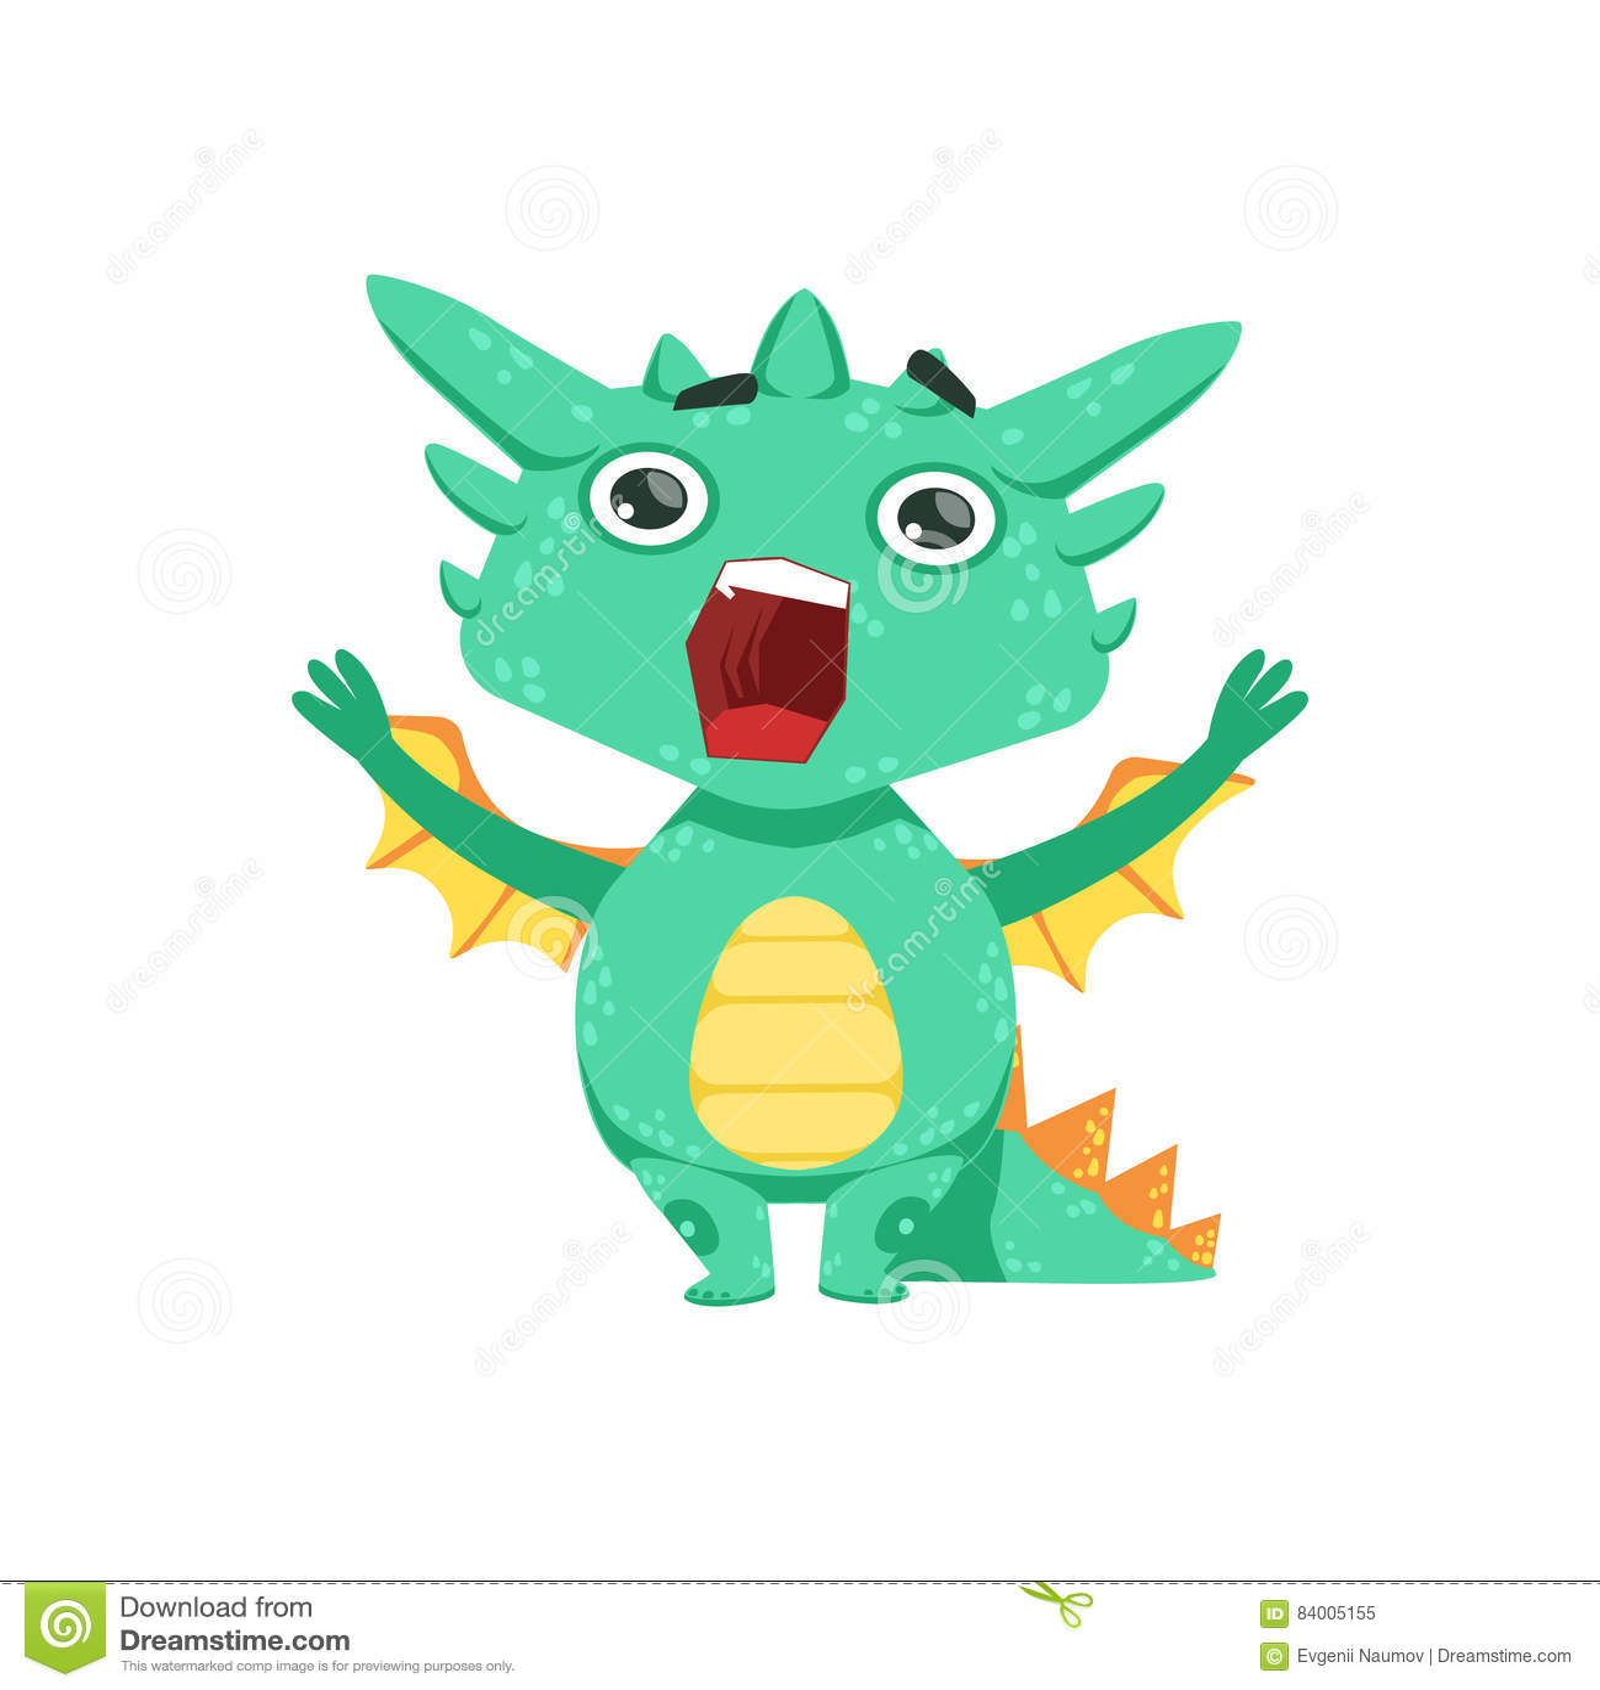 Peu d illustration d Emoji de caractère de Dragon Shouting And Screaming Cartoon de bébé de style d Anime